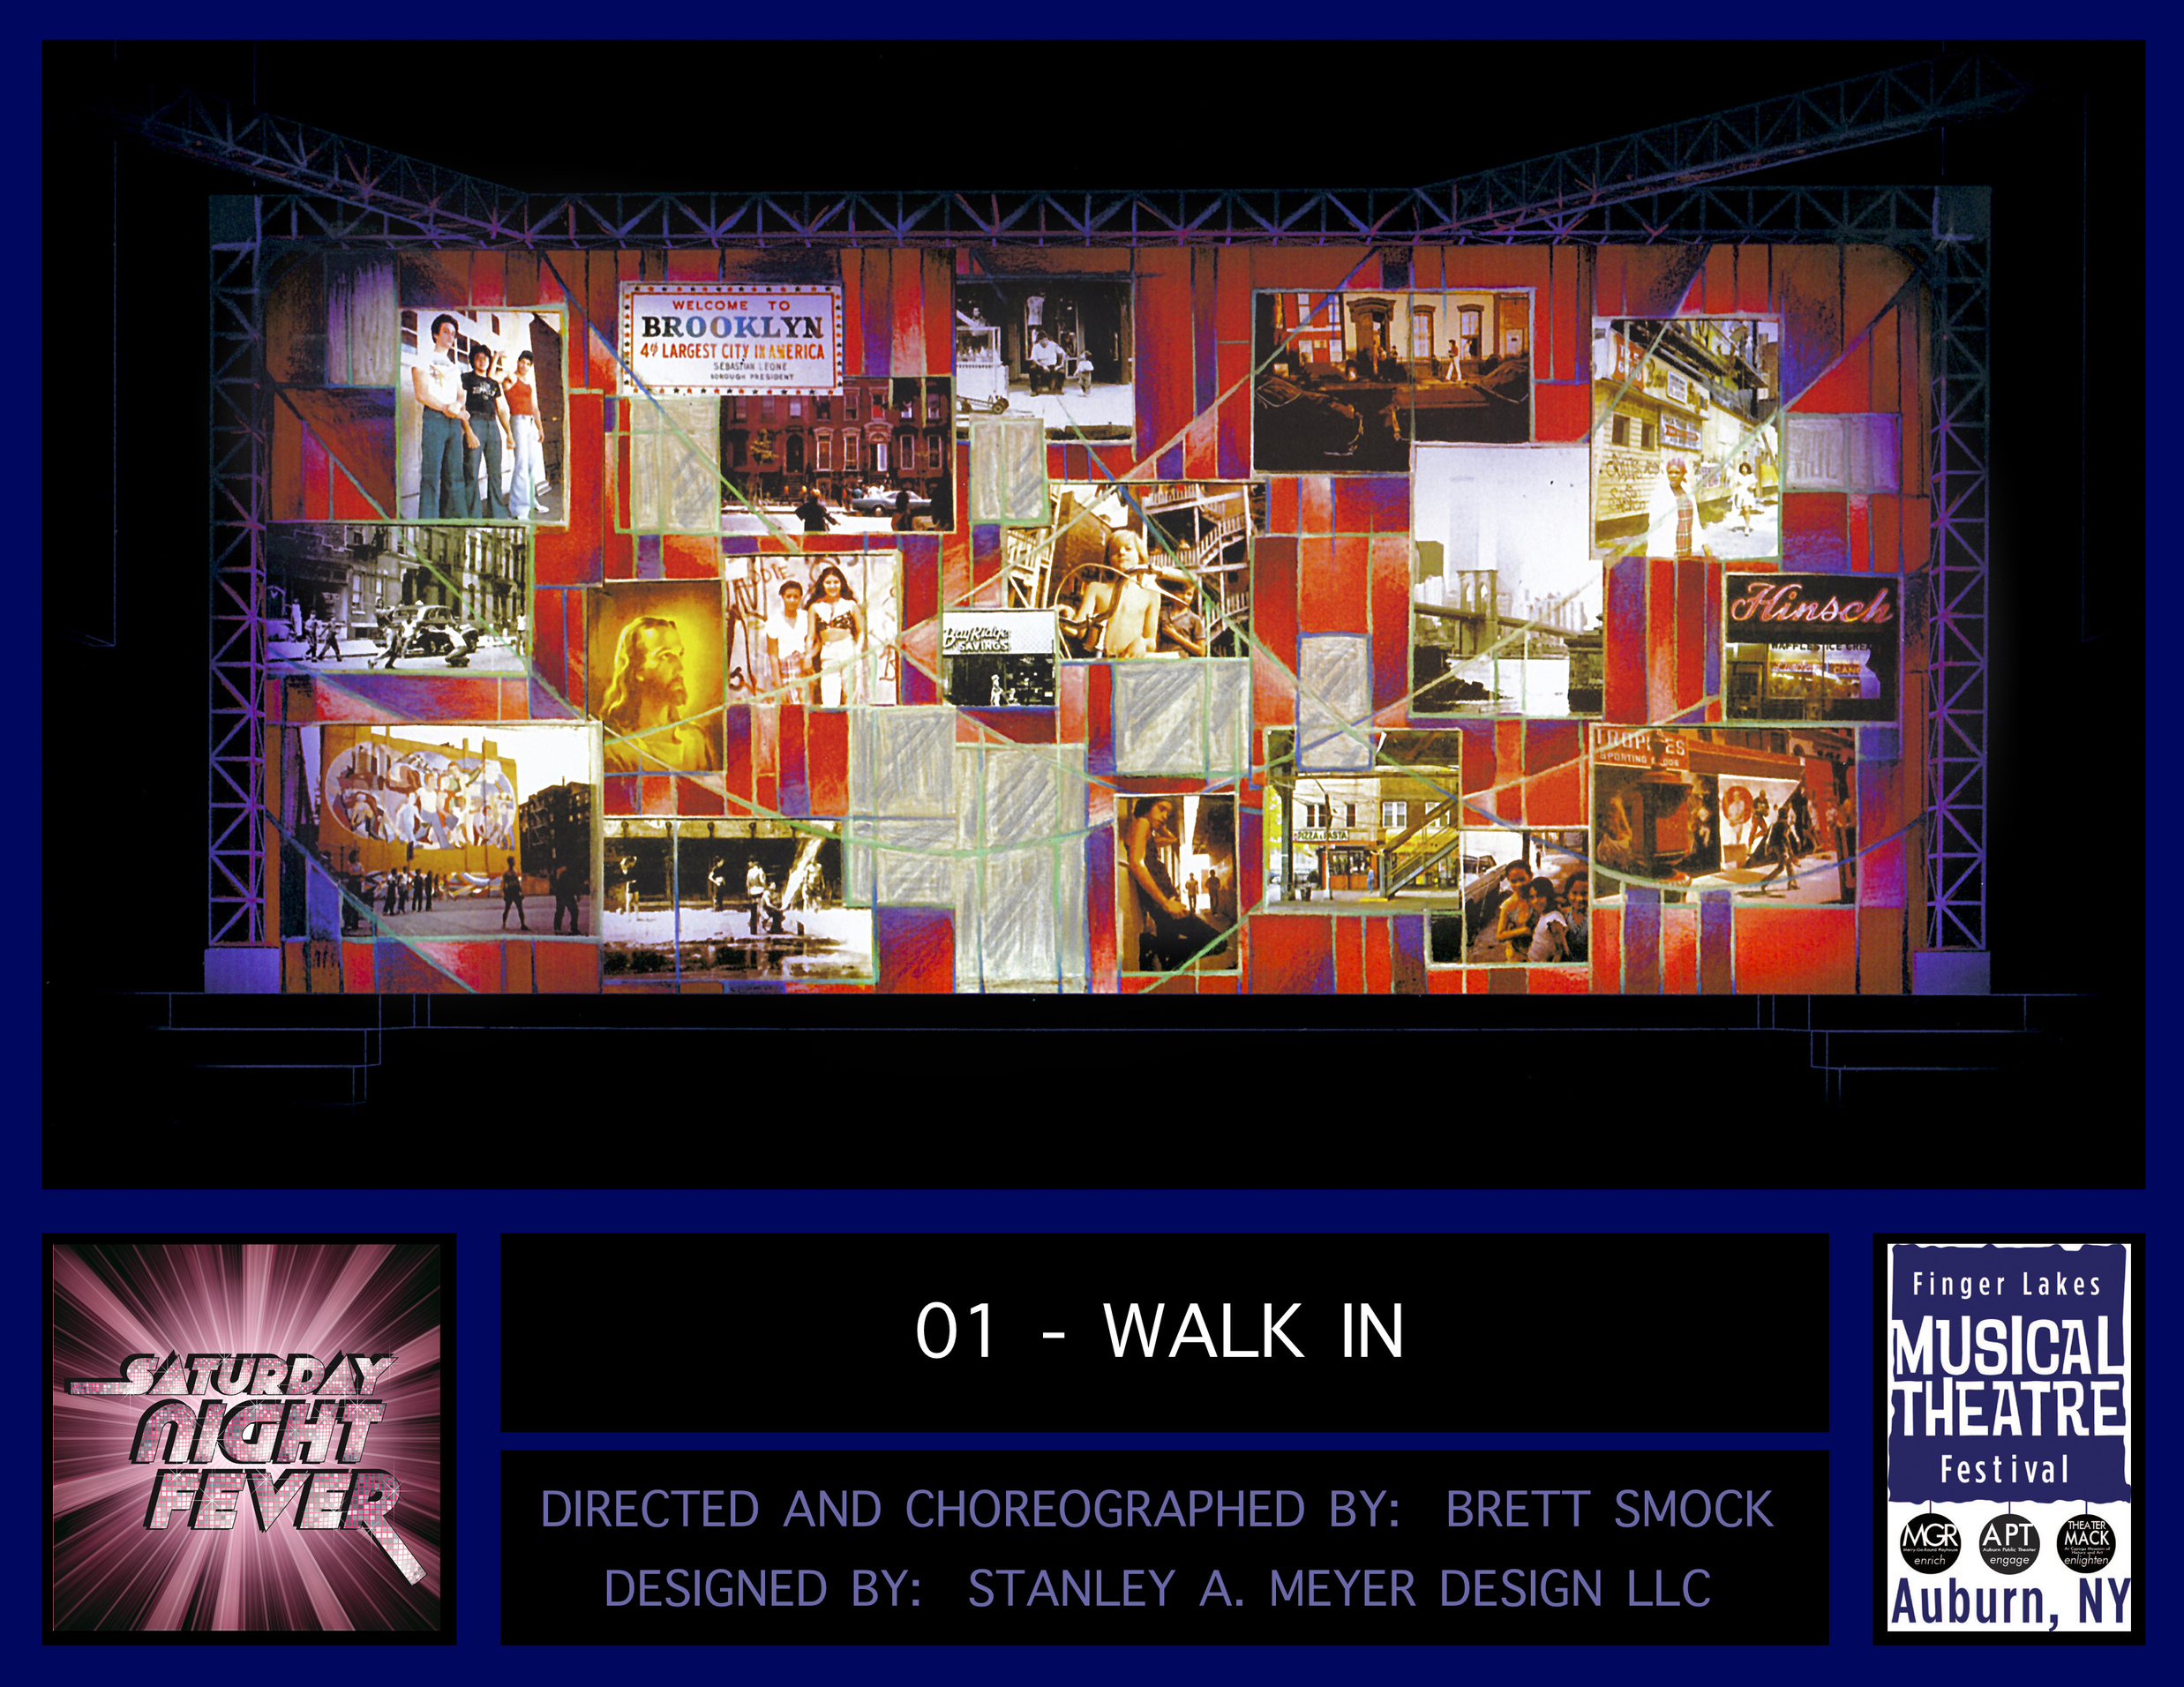 snf-01-walk_in.jpg